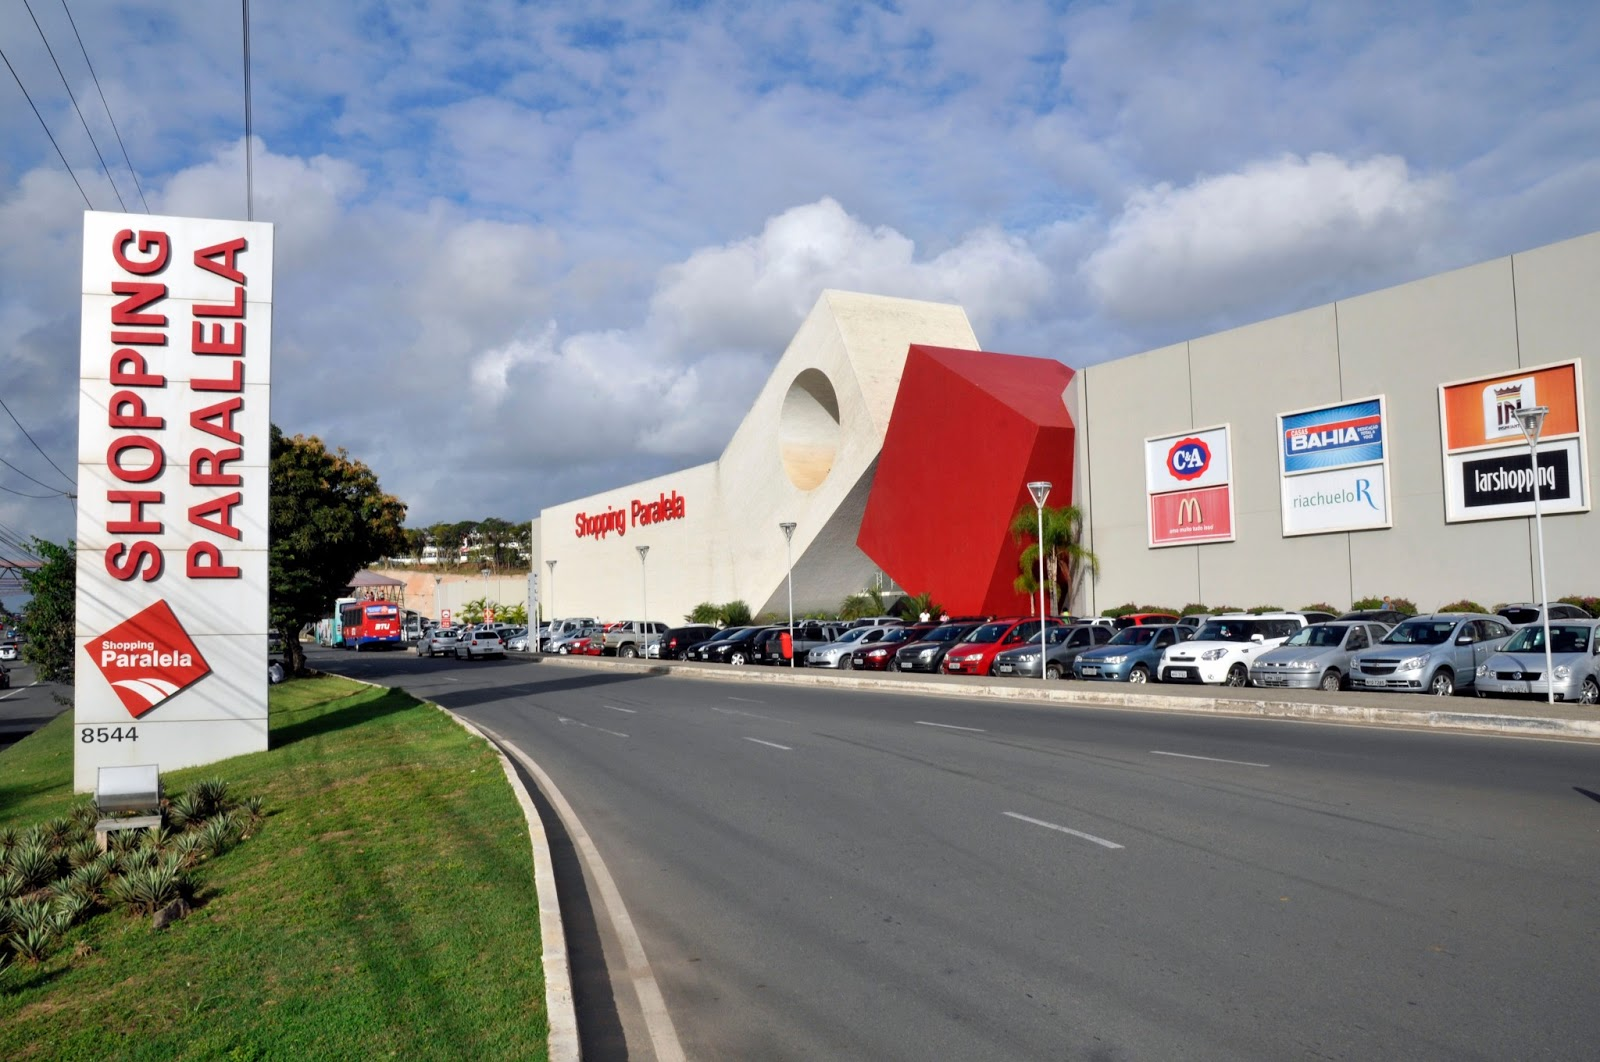 Resultado de imagem para shopping paralela fachada